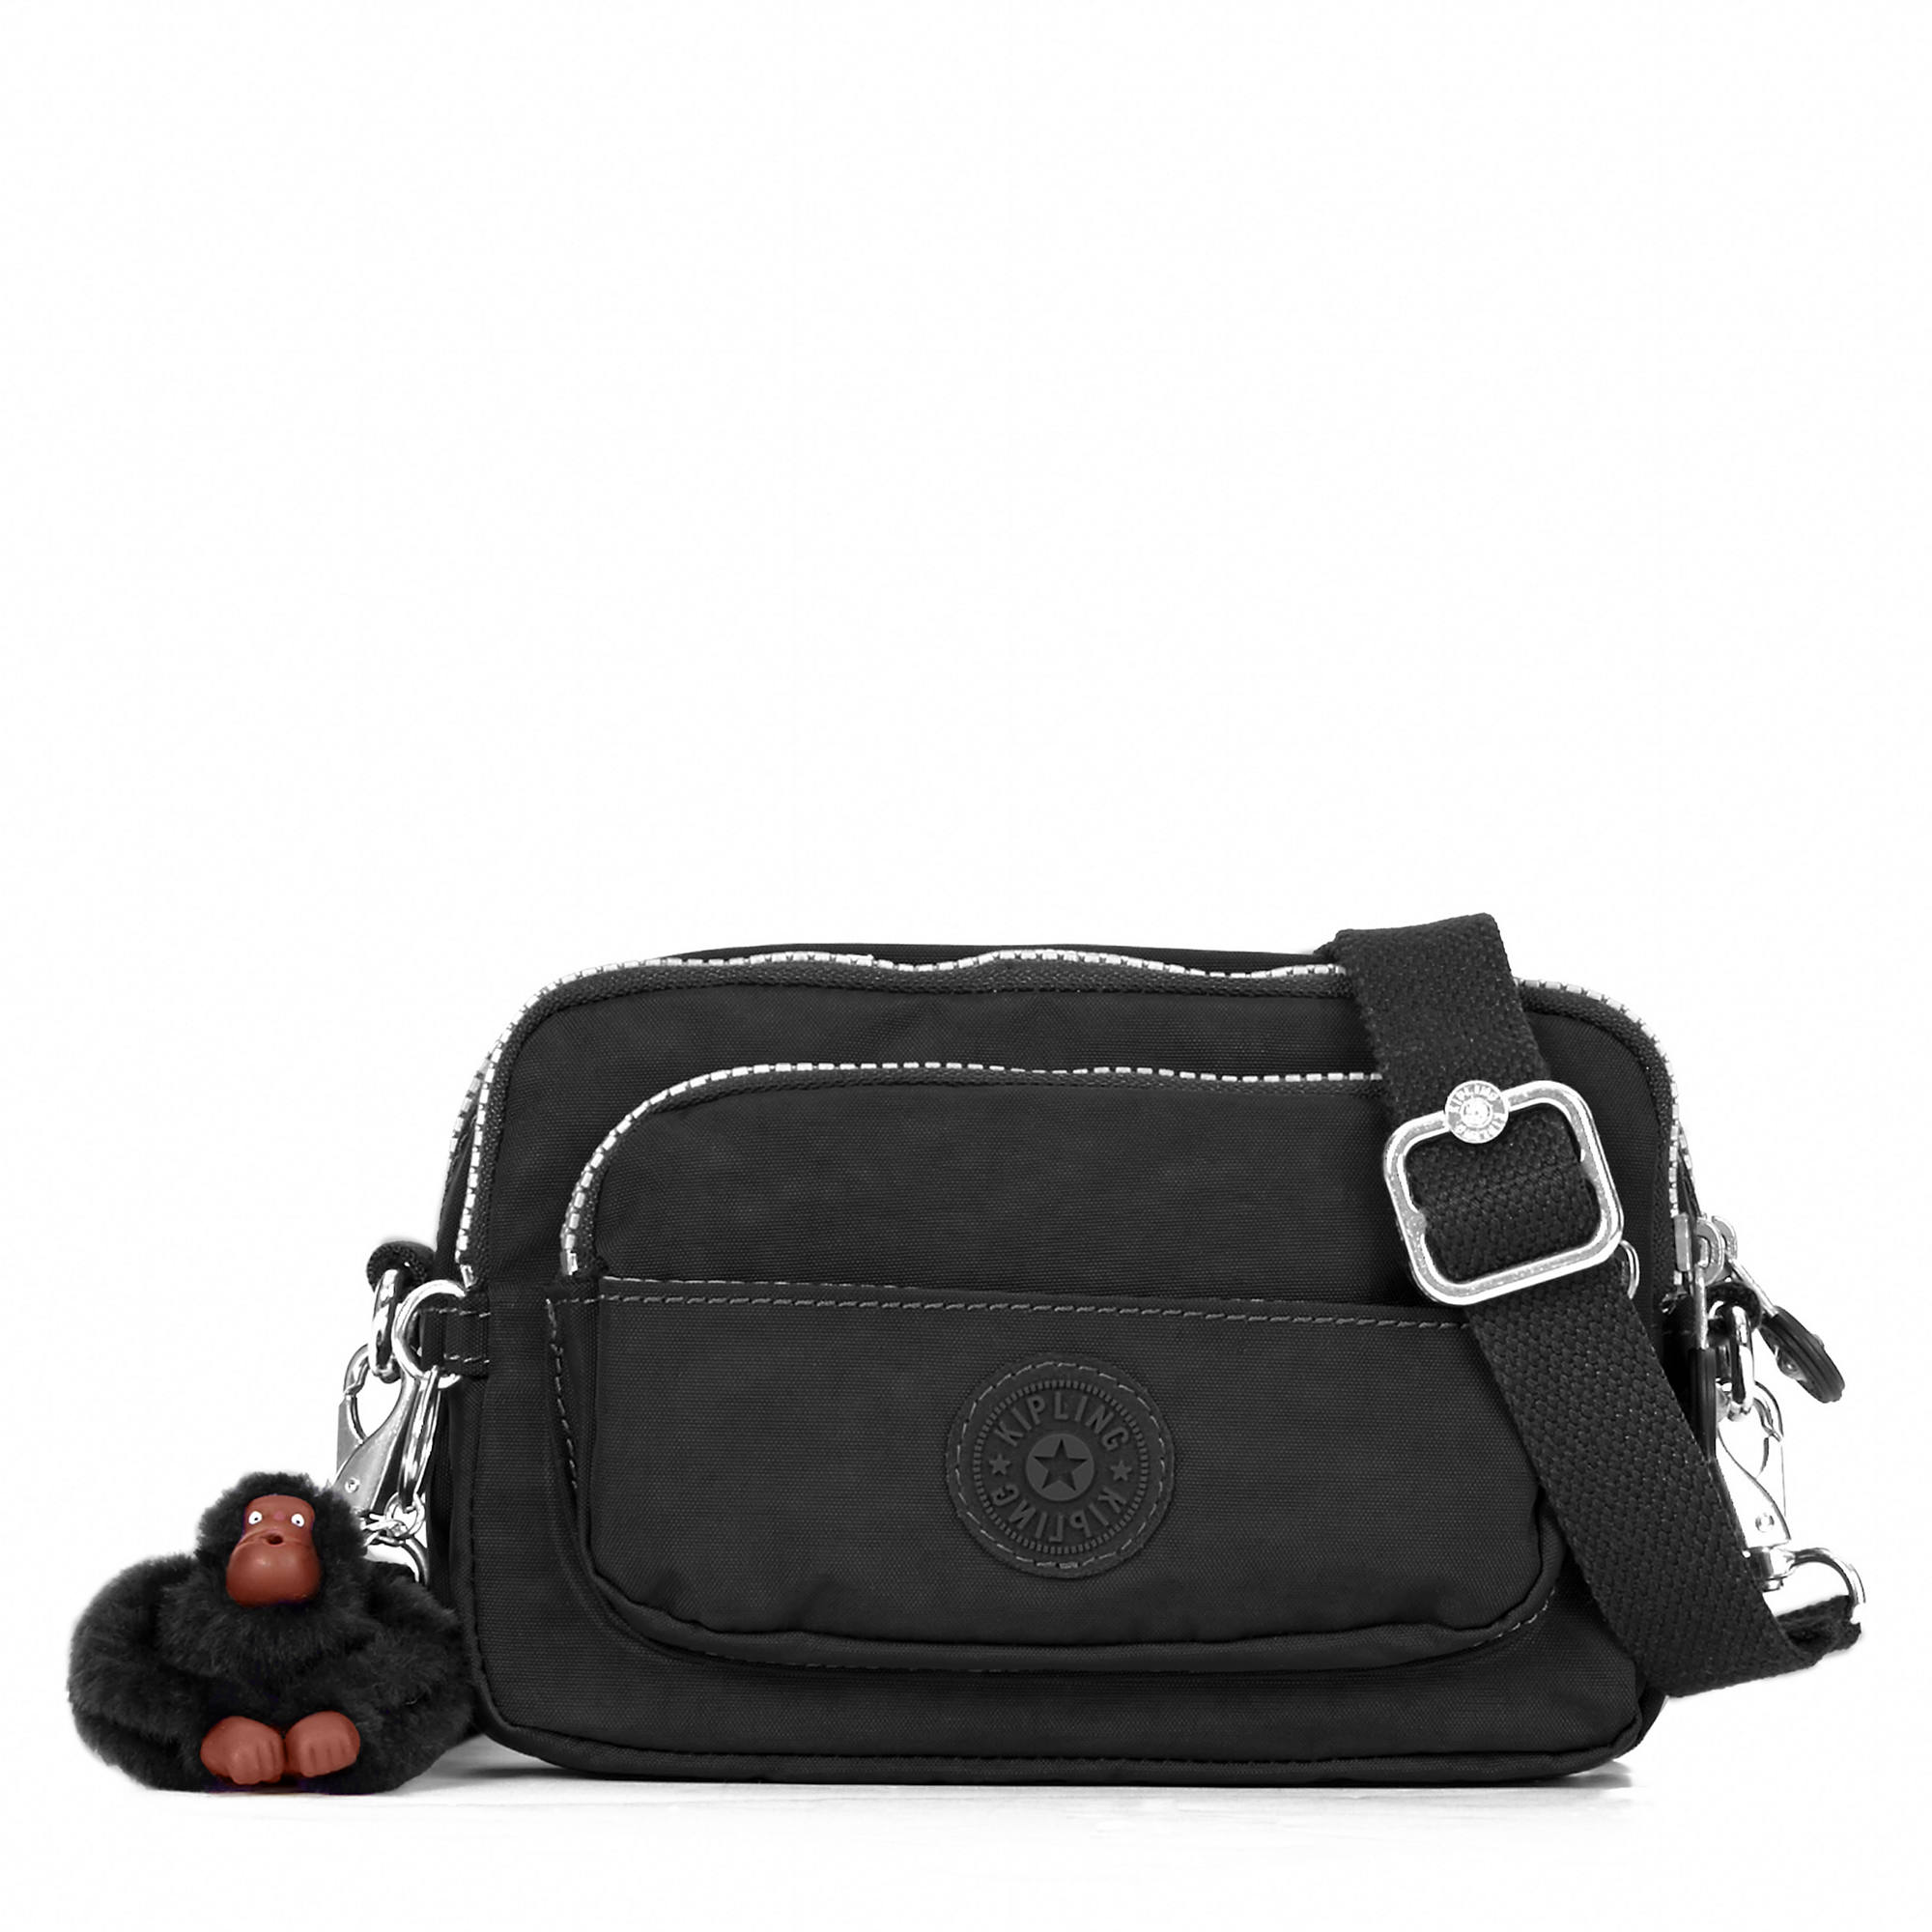 Merryl 2 In 1 Convertible Crossbody Bag Black Large